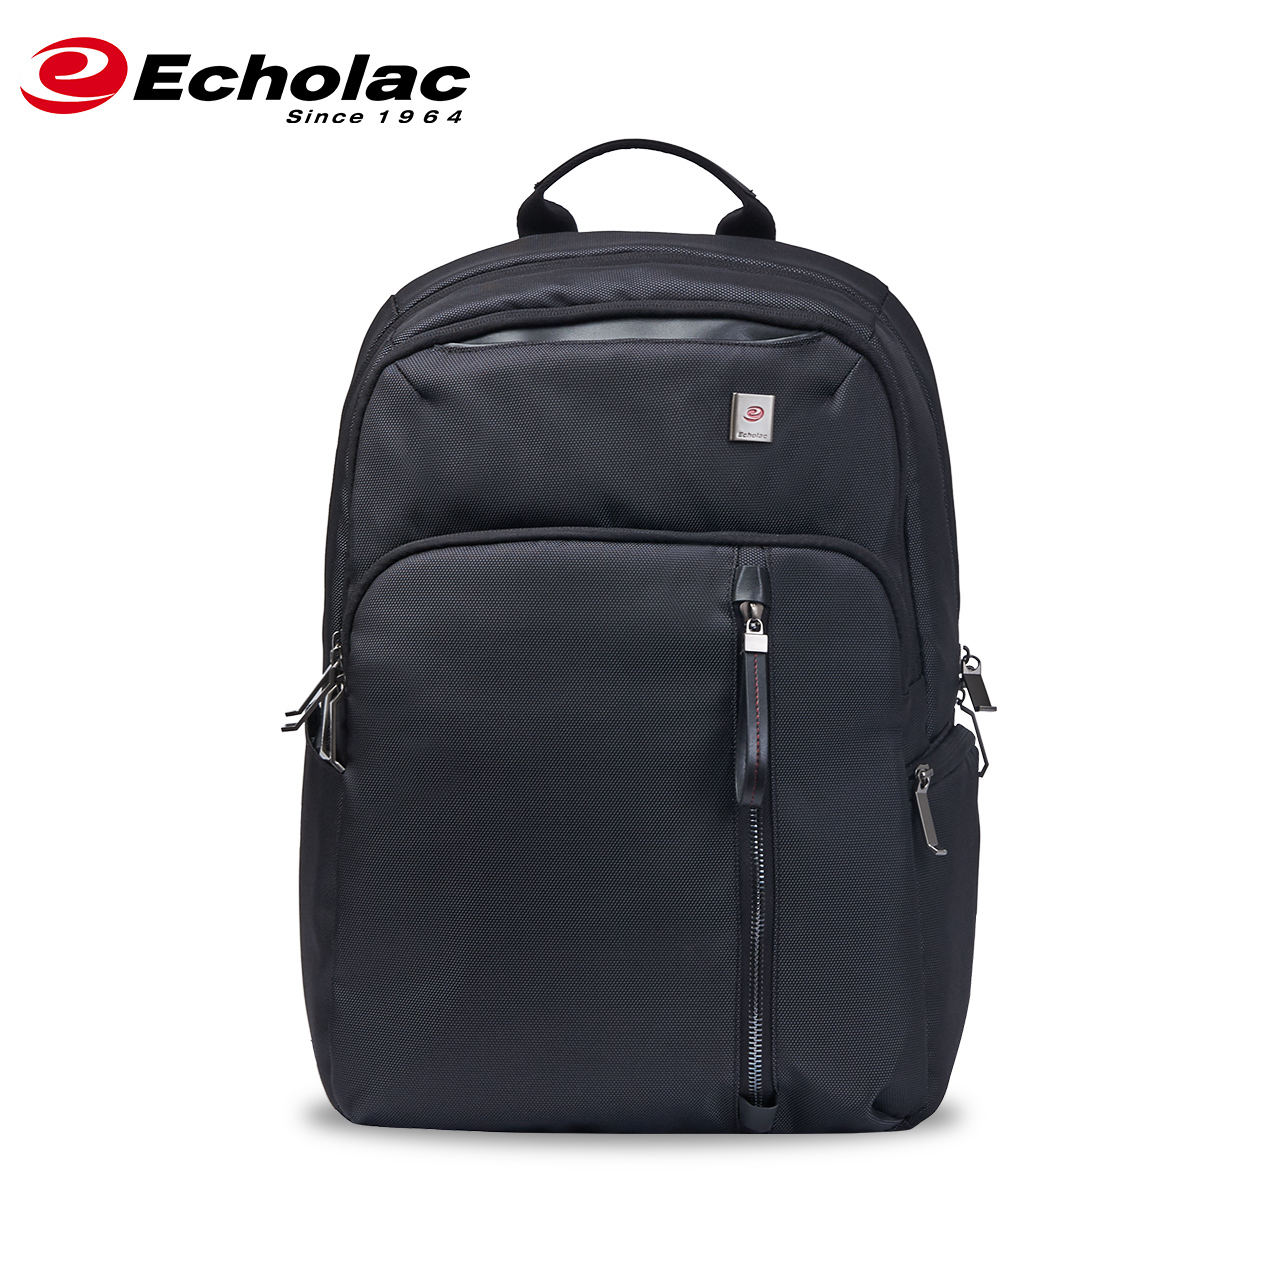 usd 283 57 echolac love cola casual backpack men s laptop bag large